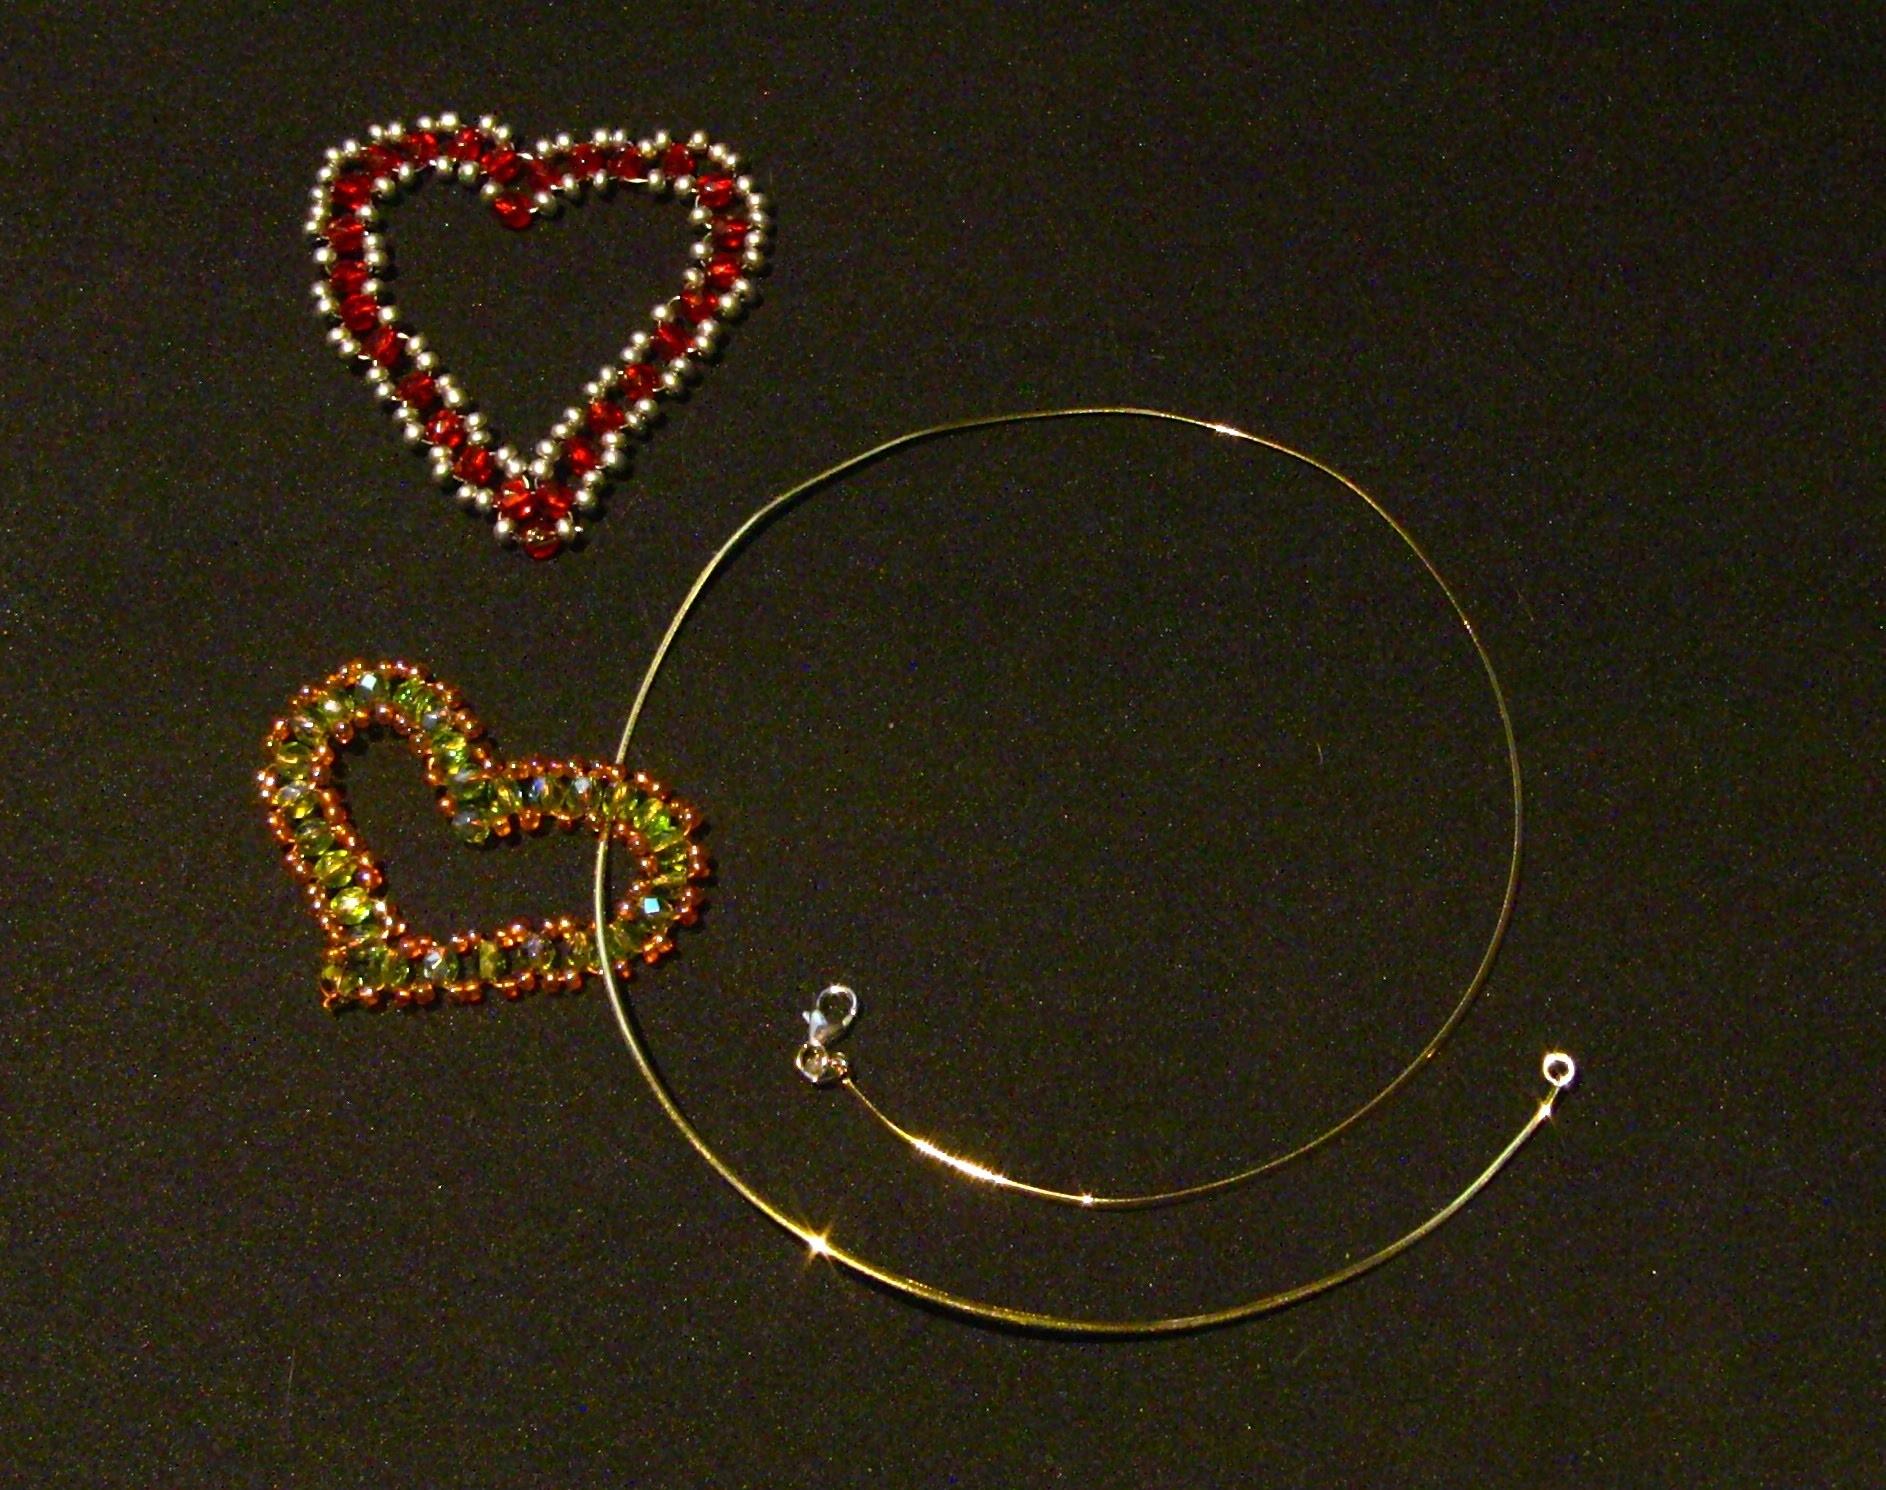 D.I.Y.  Coraçao de miçangas - CRYSTAL HEART PENDANT -tutorial